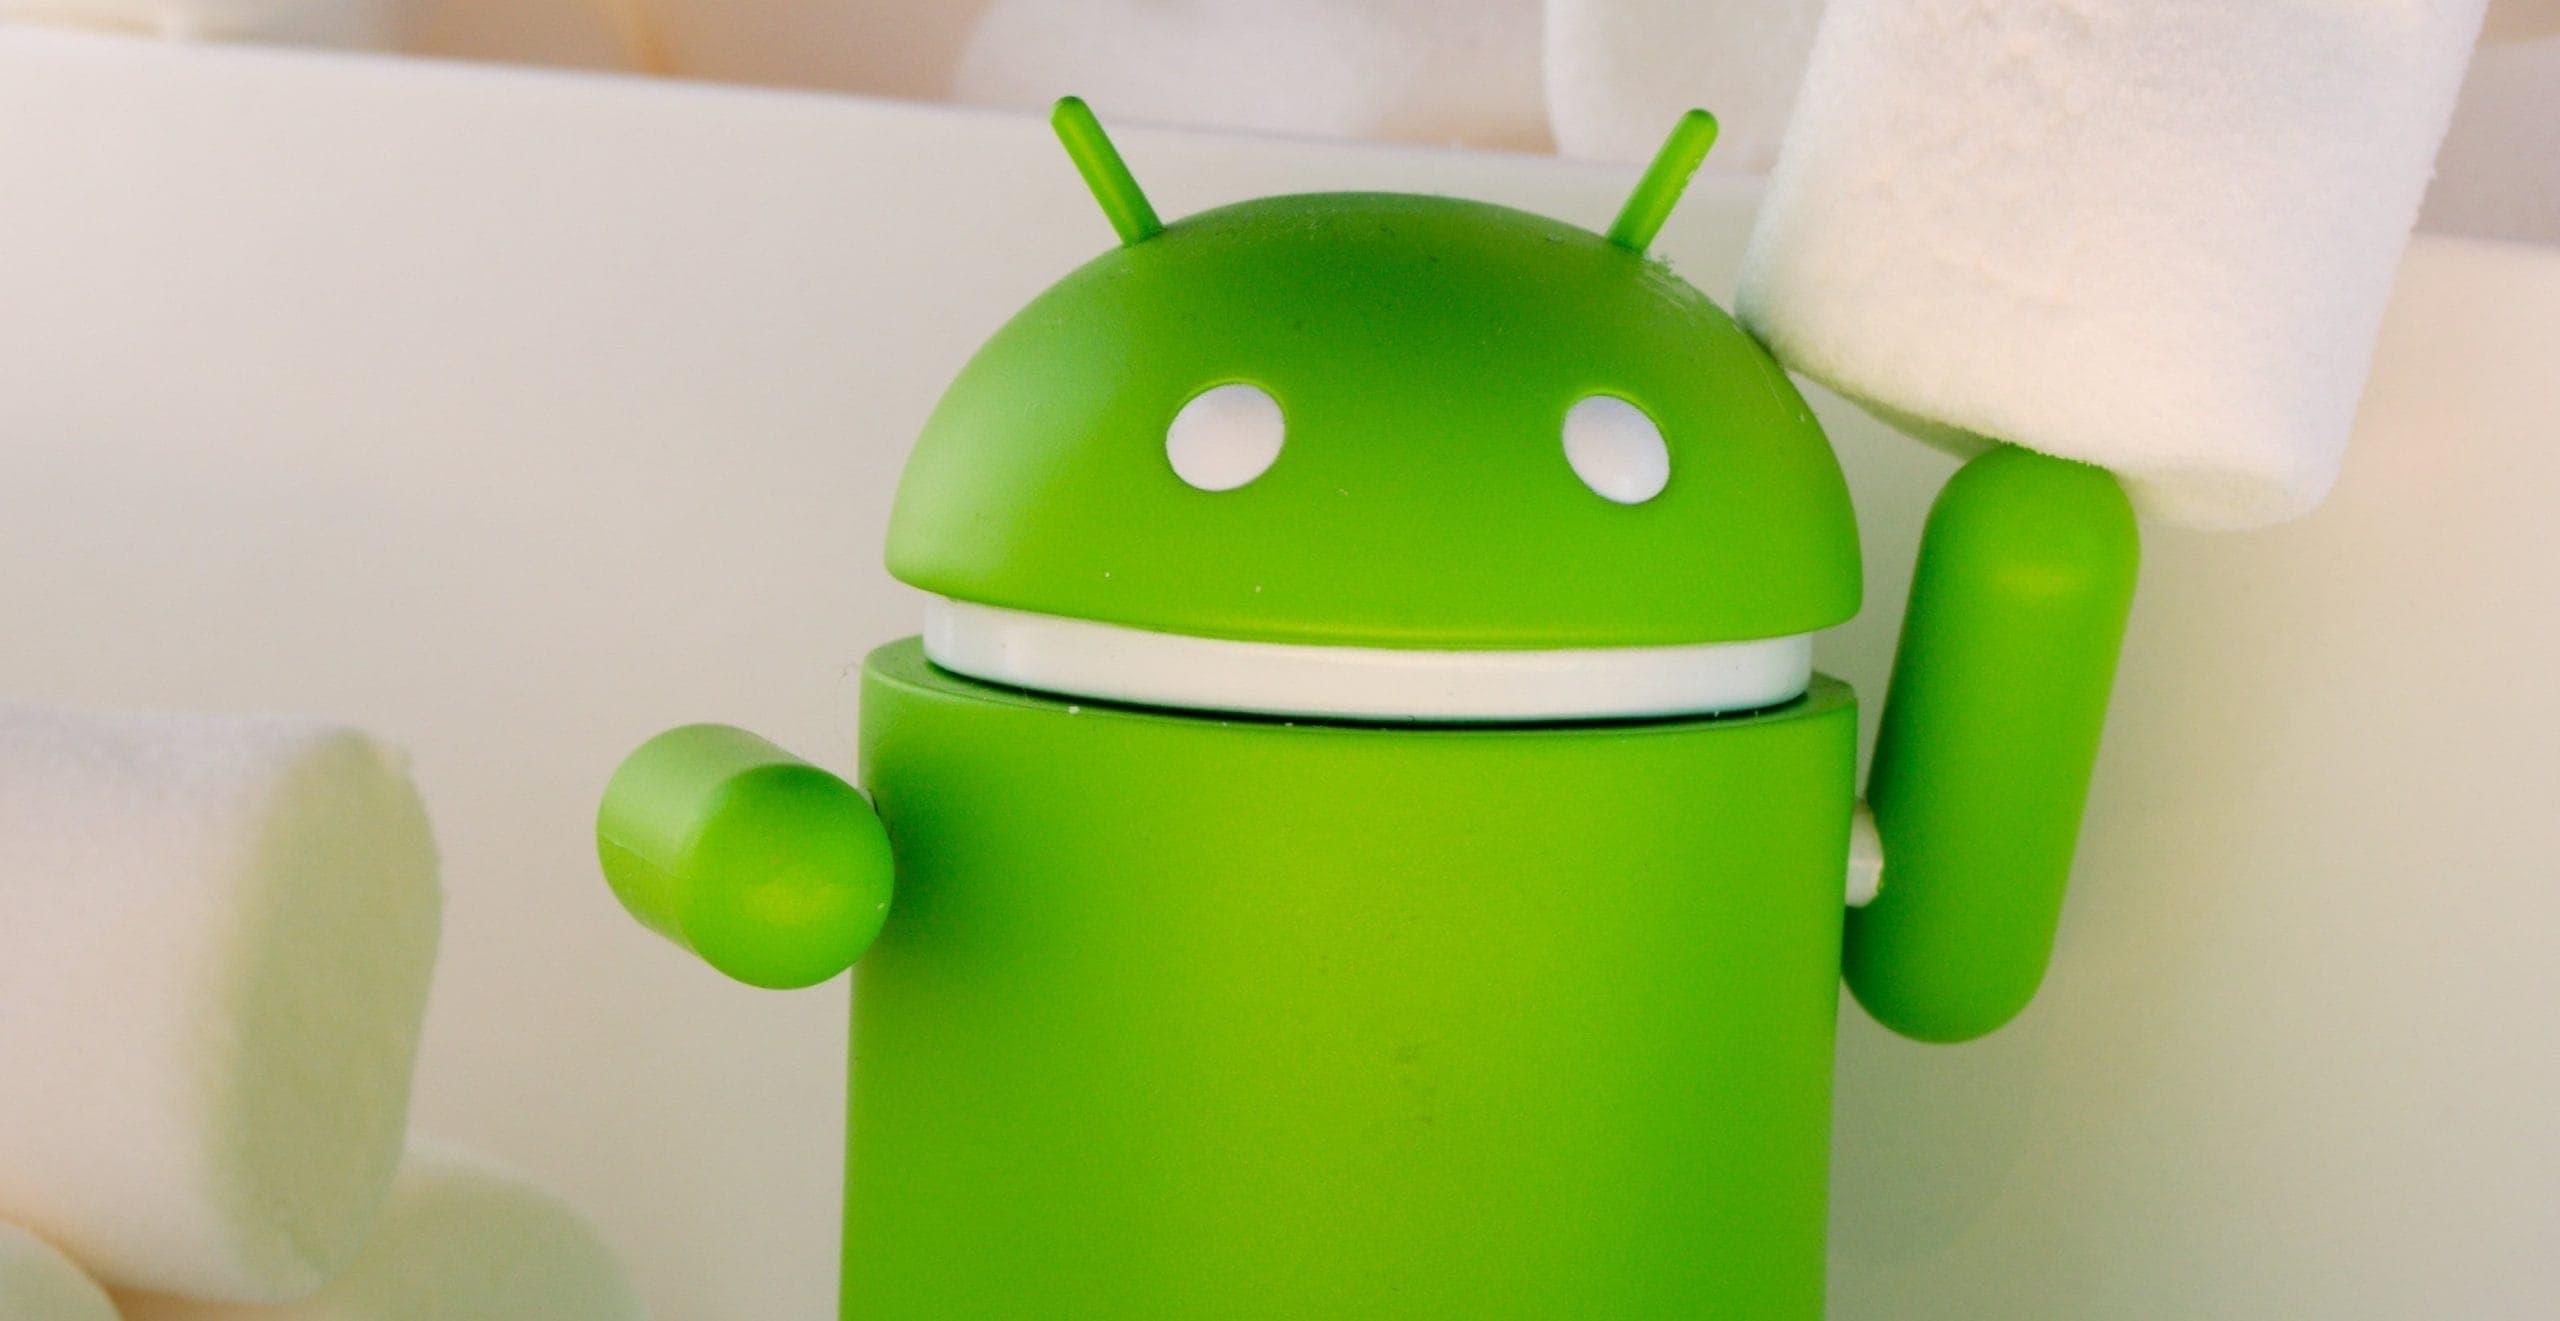 Besten Android-Security-Apps